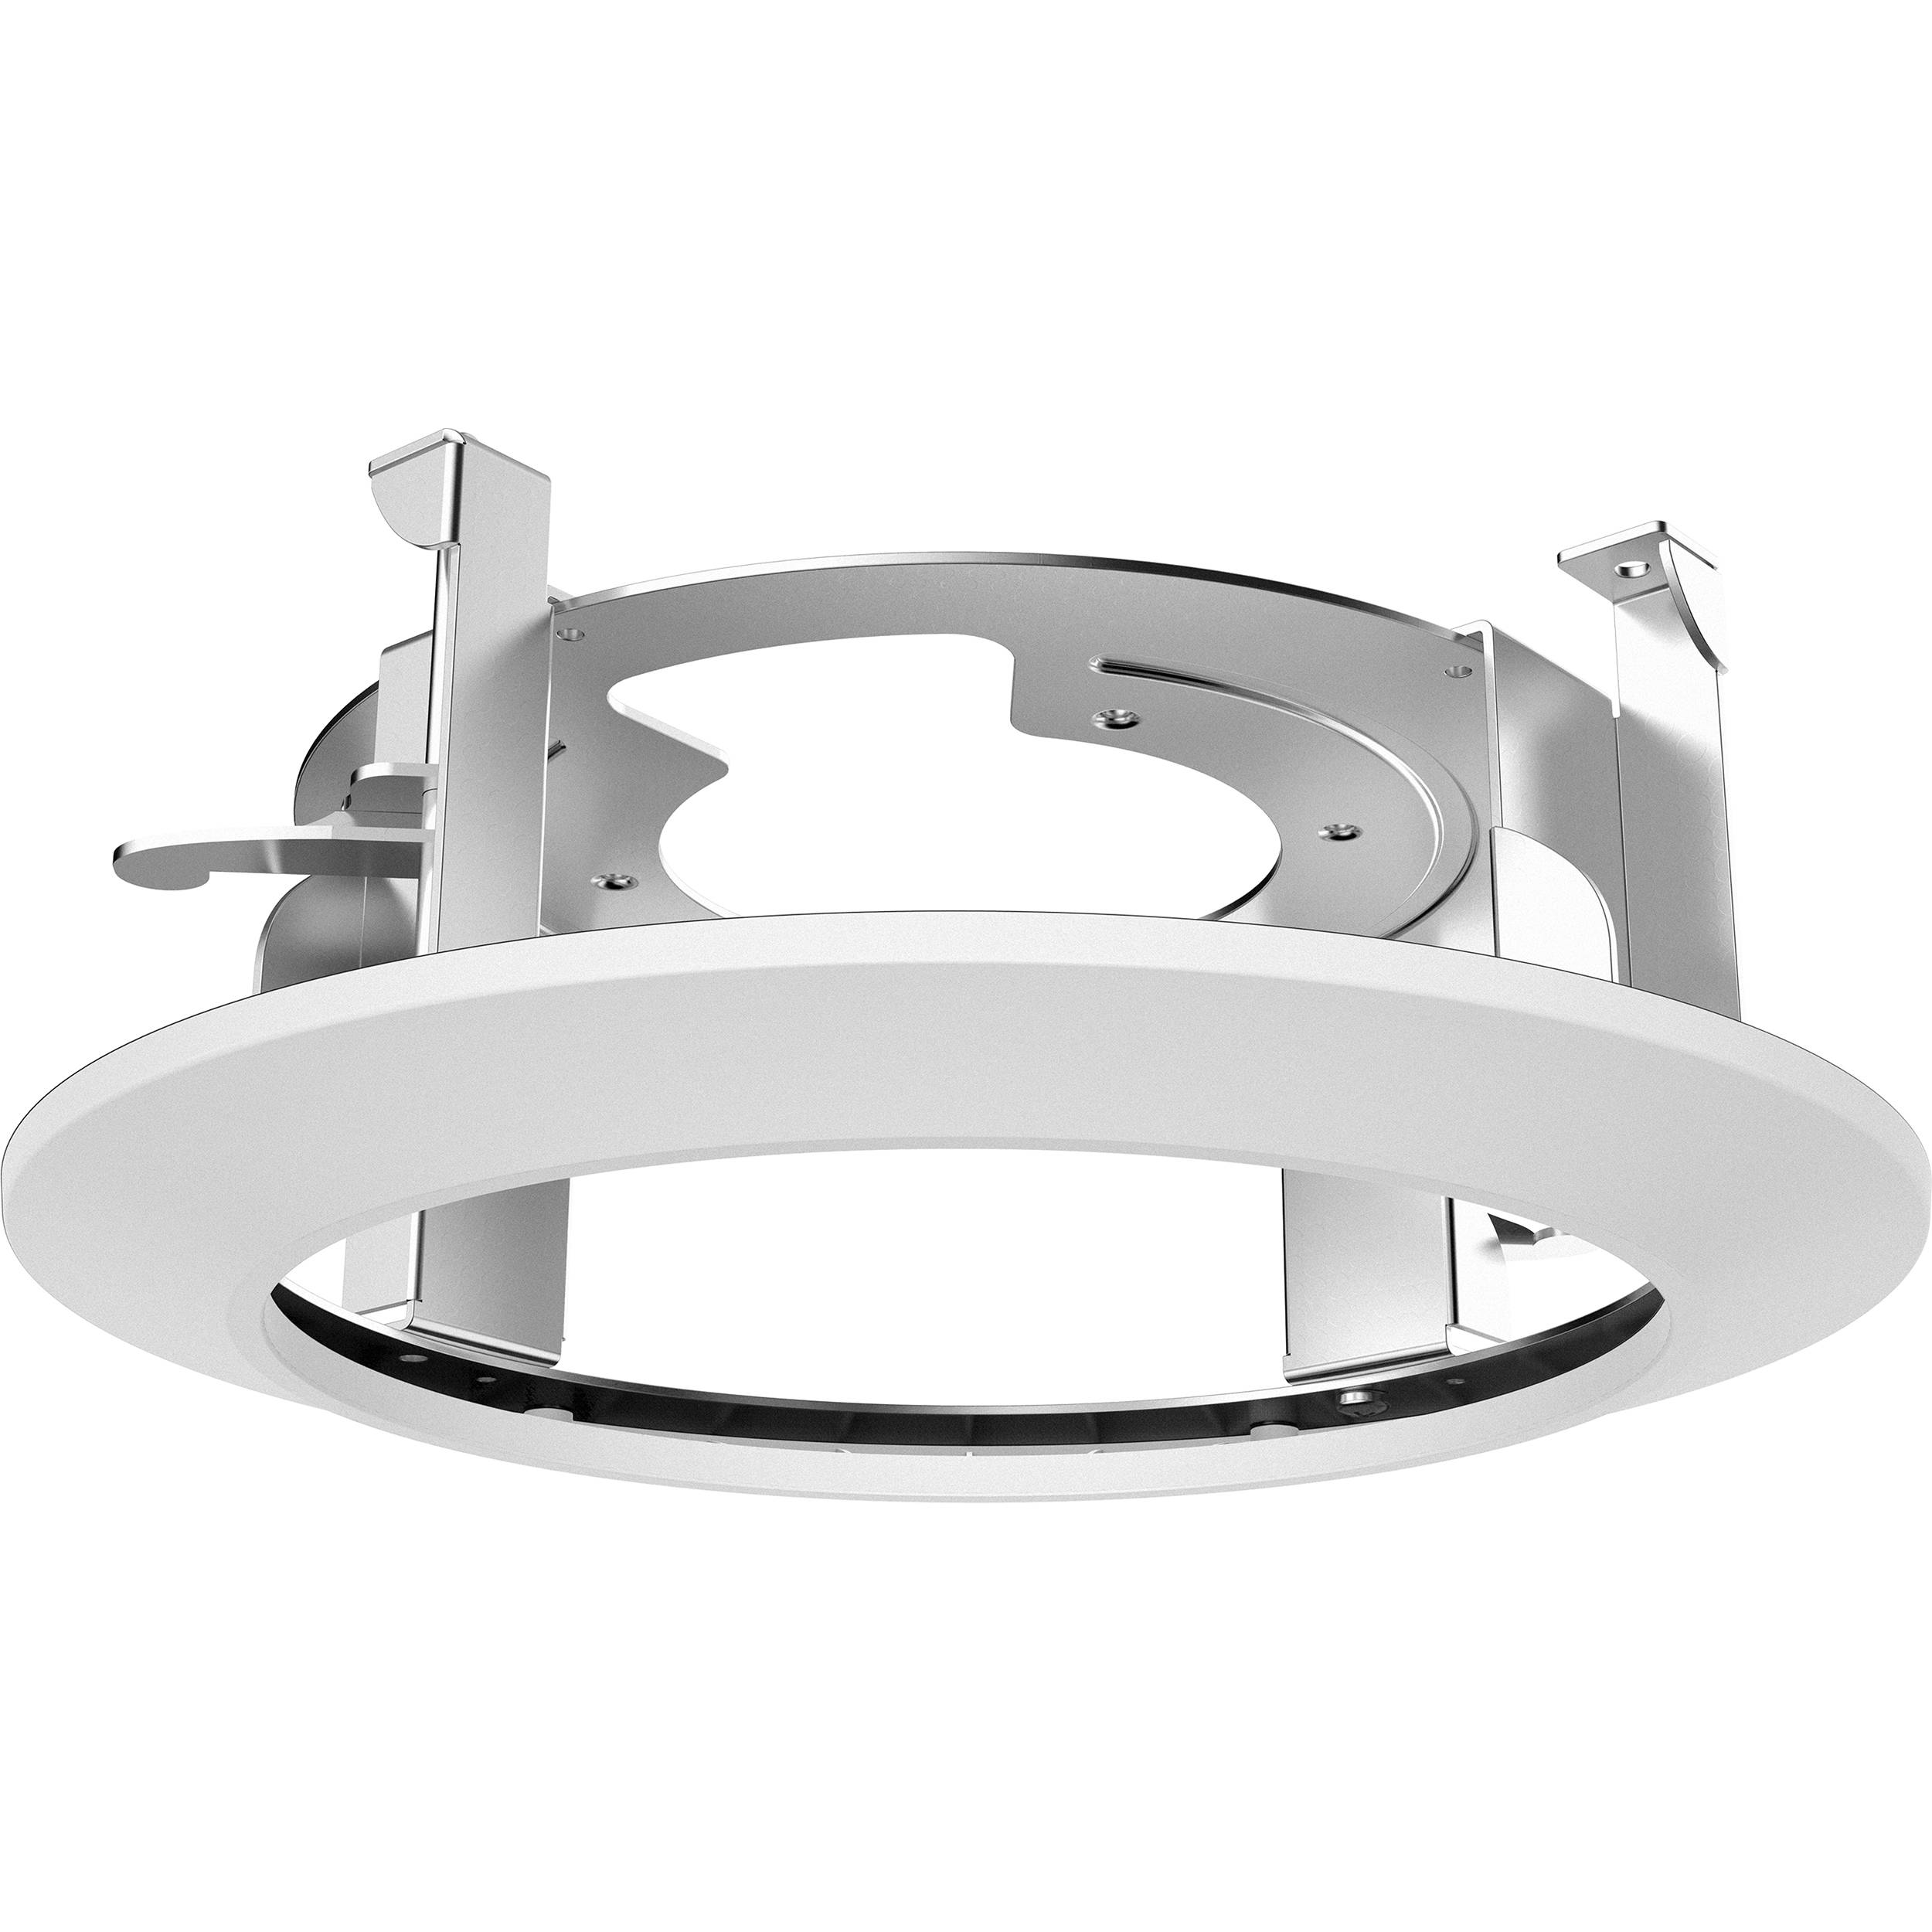 Hikvision Rcm De4a In Ceiling Mounting Bracket For Ds 2de4 Series Cameras